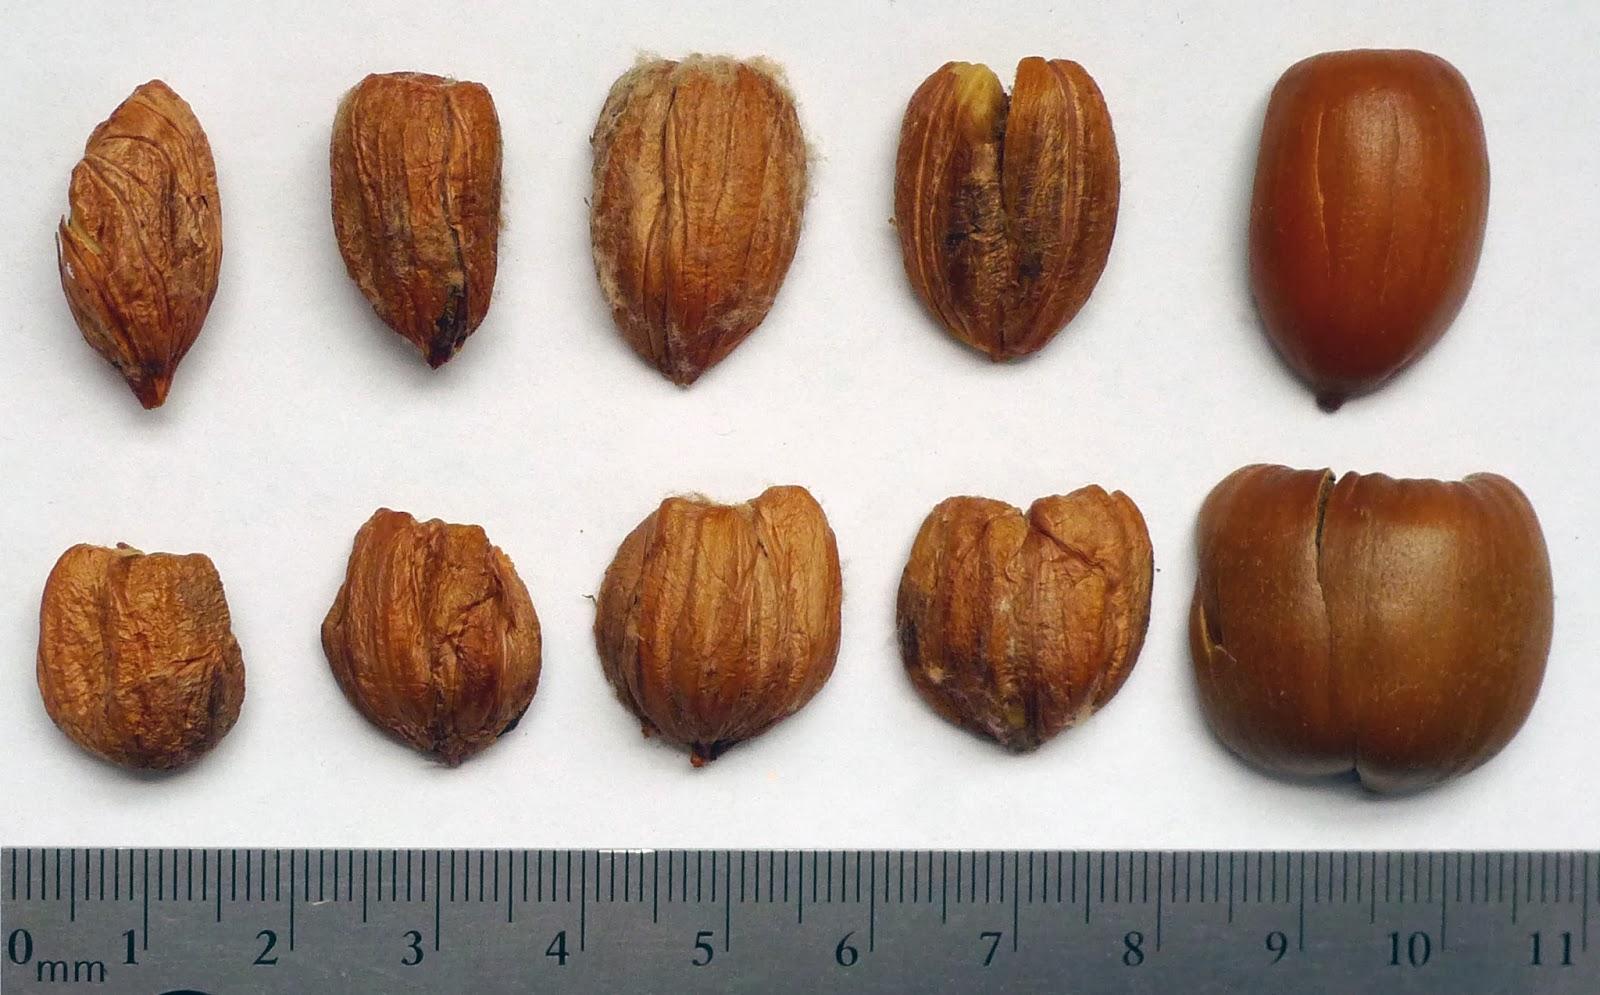 Wild harvests percolation leaching red oak acorns